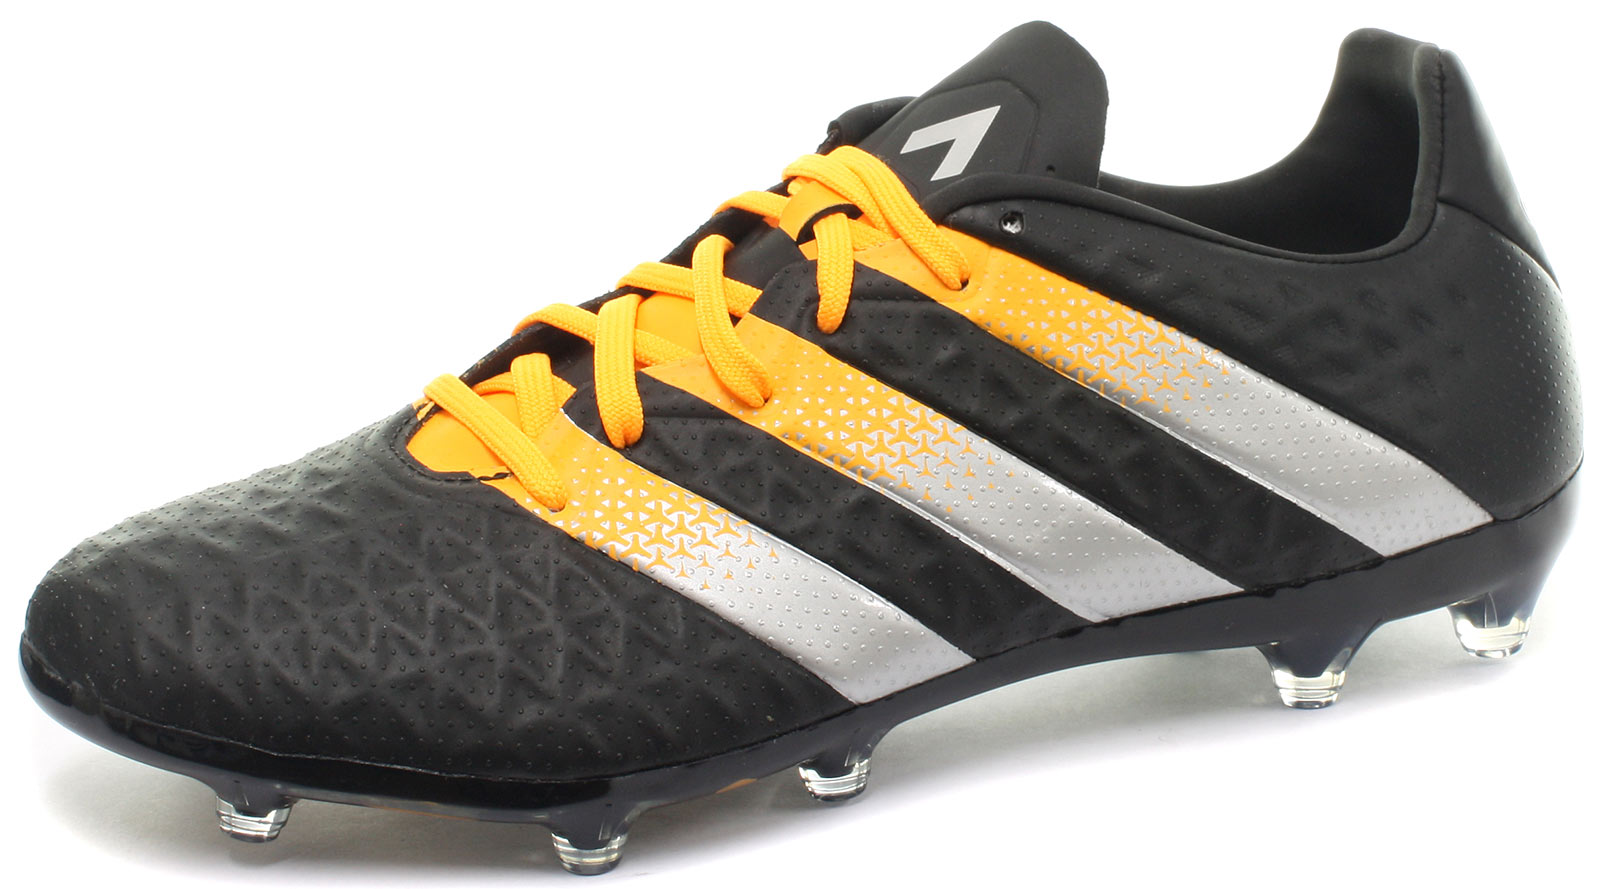 New adidas Ace Stivali 16.2 FG AG Uomo Football Stivali Ace   Soccer Cleats ALL   f2e041